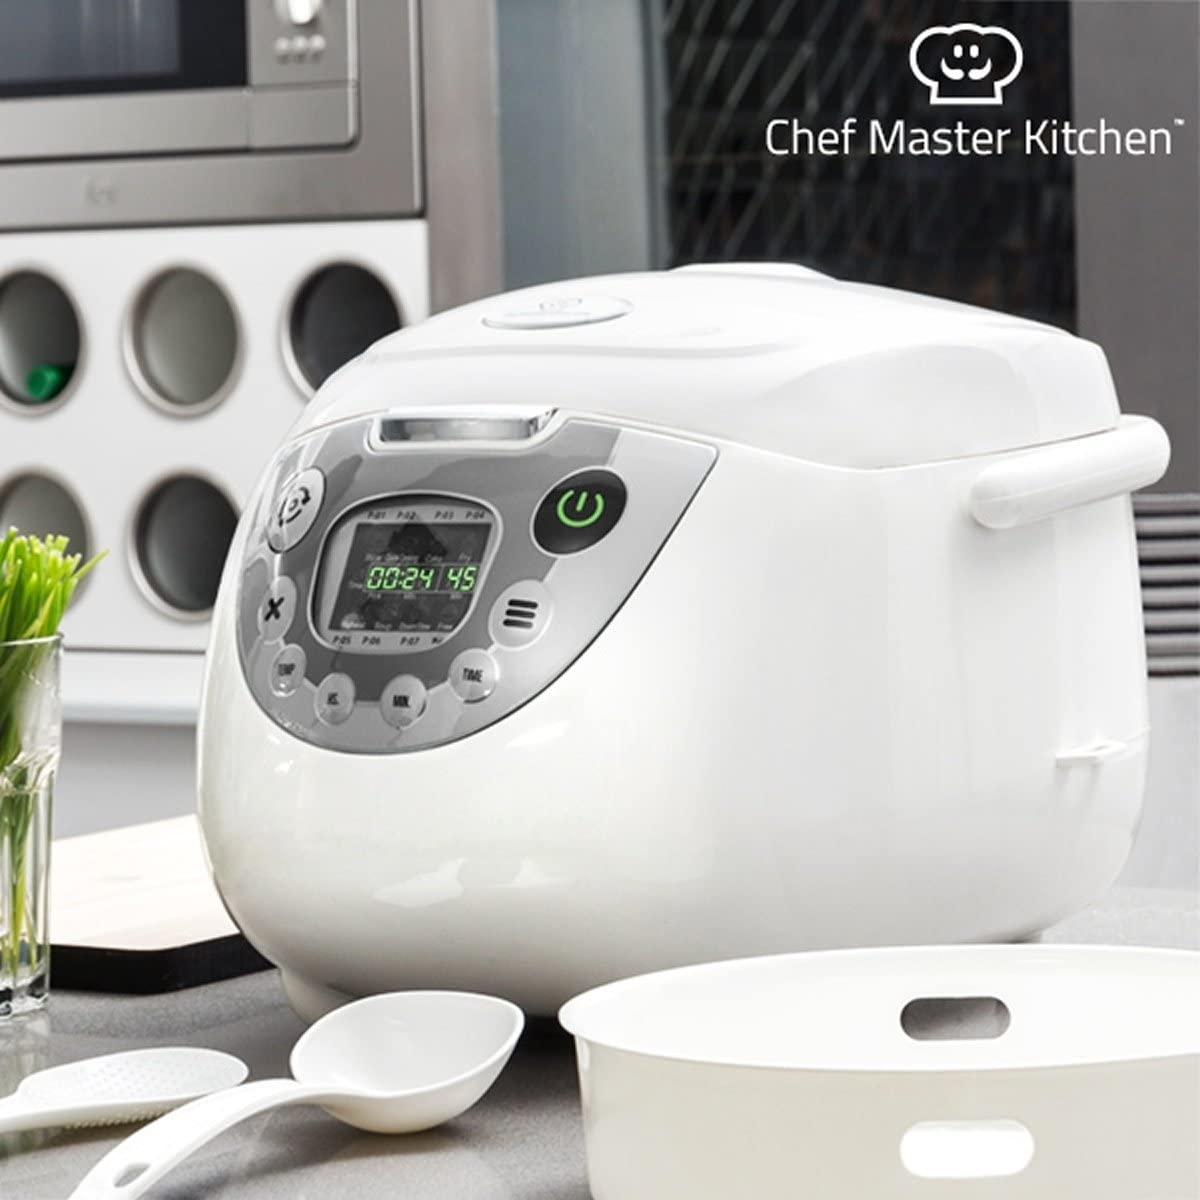 Chef Master Kitchen IG102908 Robot de cocina, 5 L, 800 W: Amazon.es: Hogar